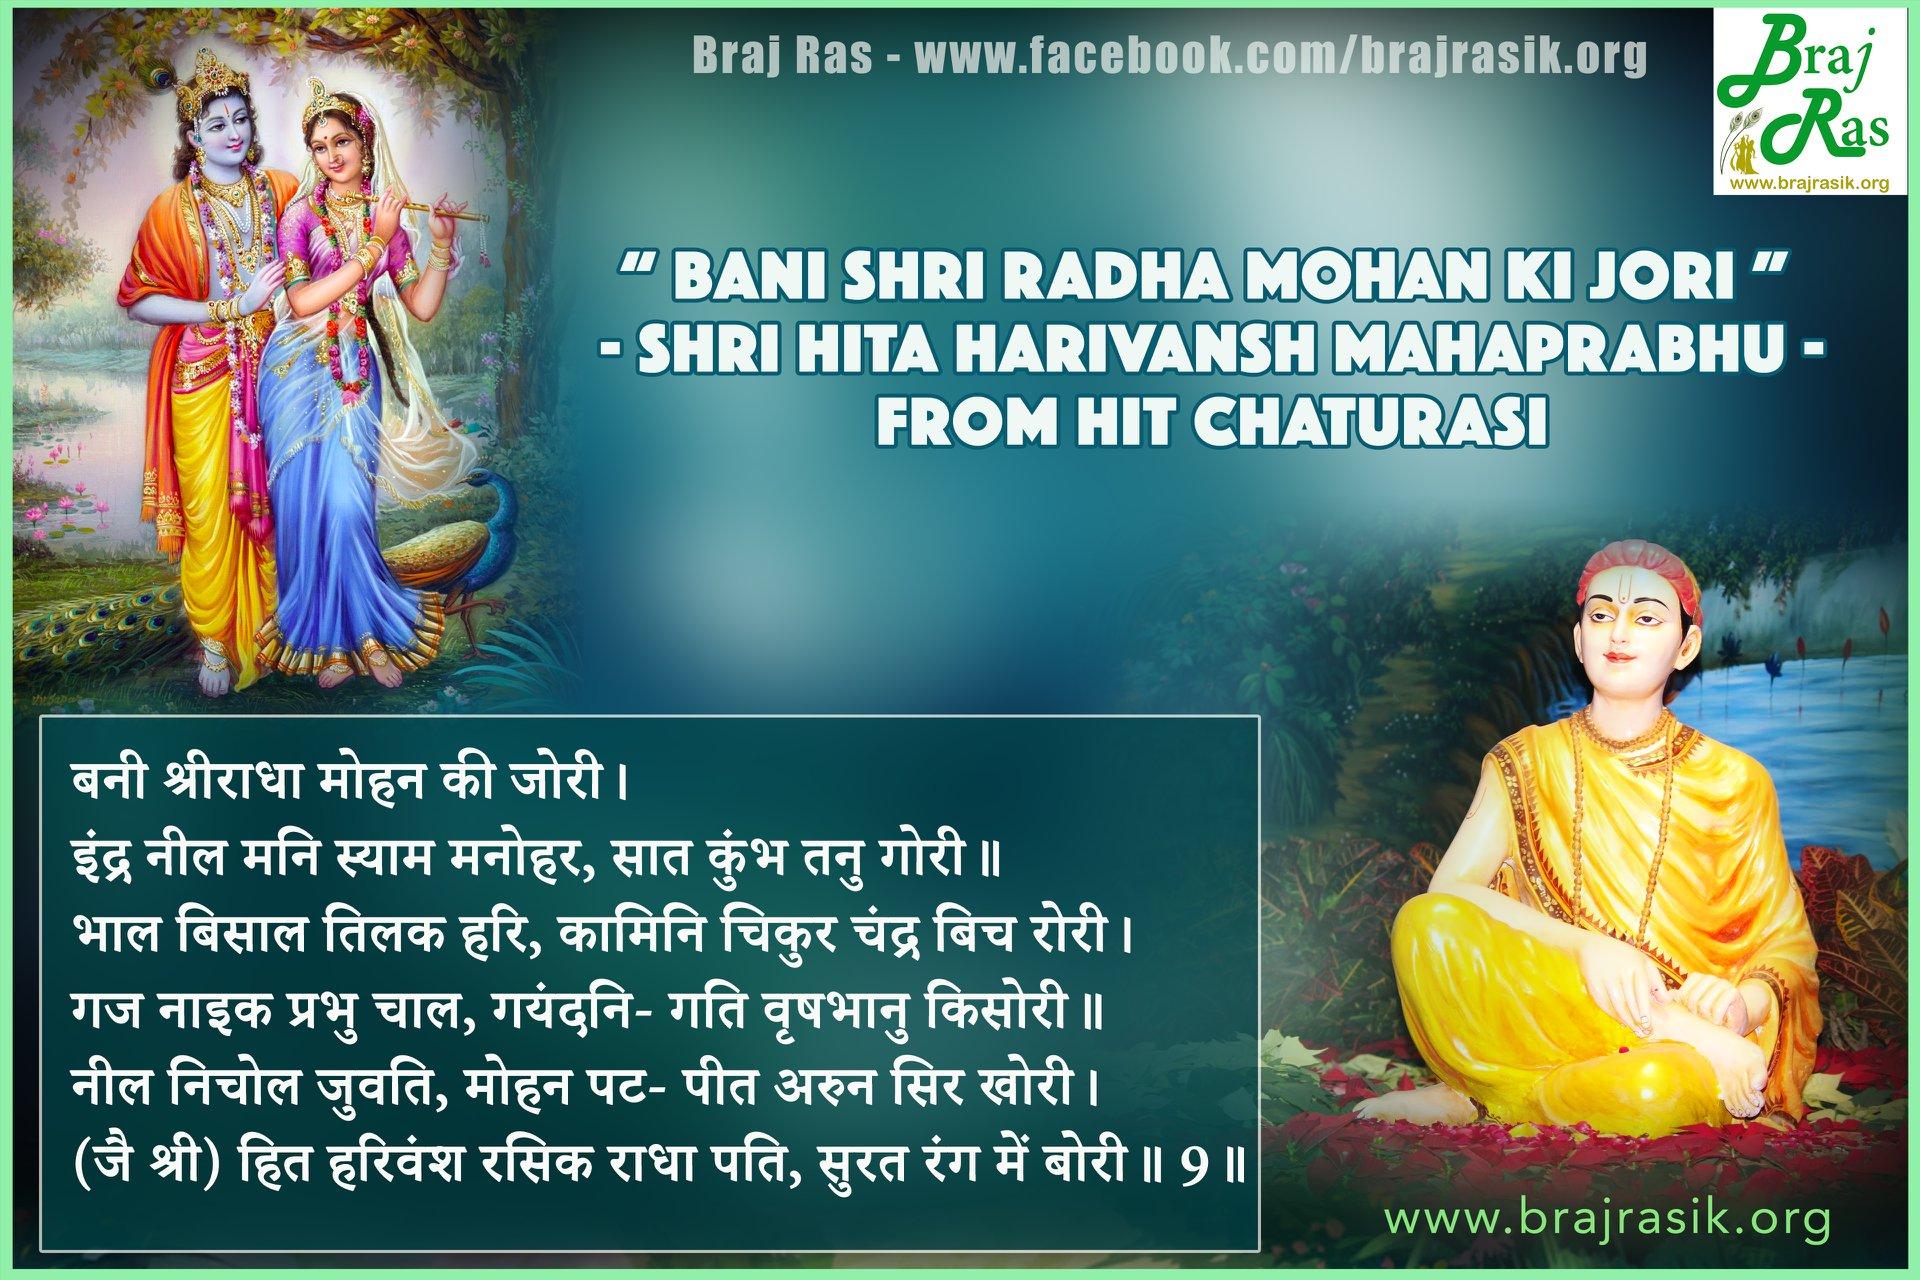 """Bani Shri Radha Mohan Ki Jori - Shri Hita Harivansh Mahaprabhu From Hit Chaturasi (09)"